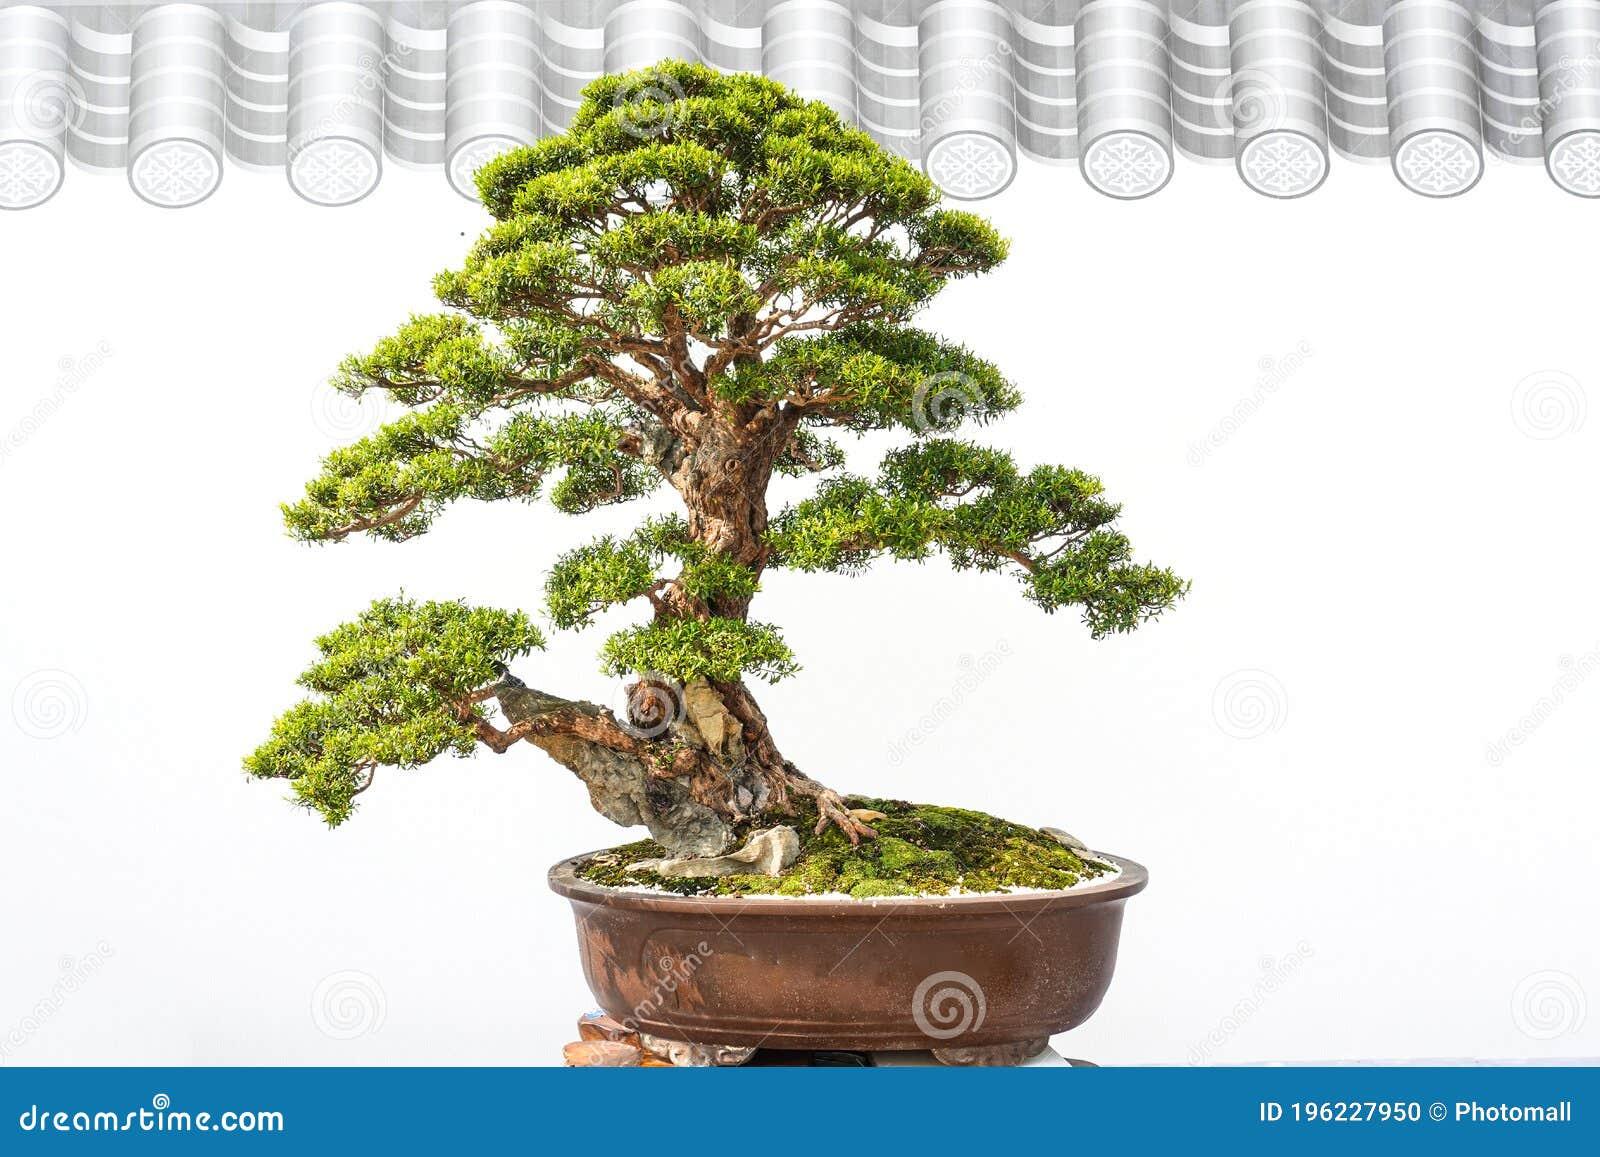 175 Bonsai Yew Photos Free Royalty Free Stock Photos From Dreamstime